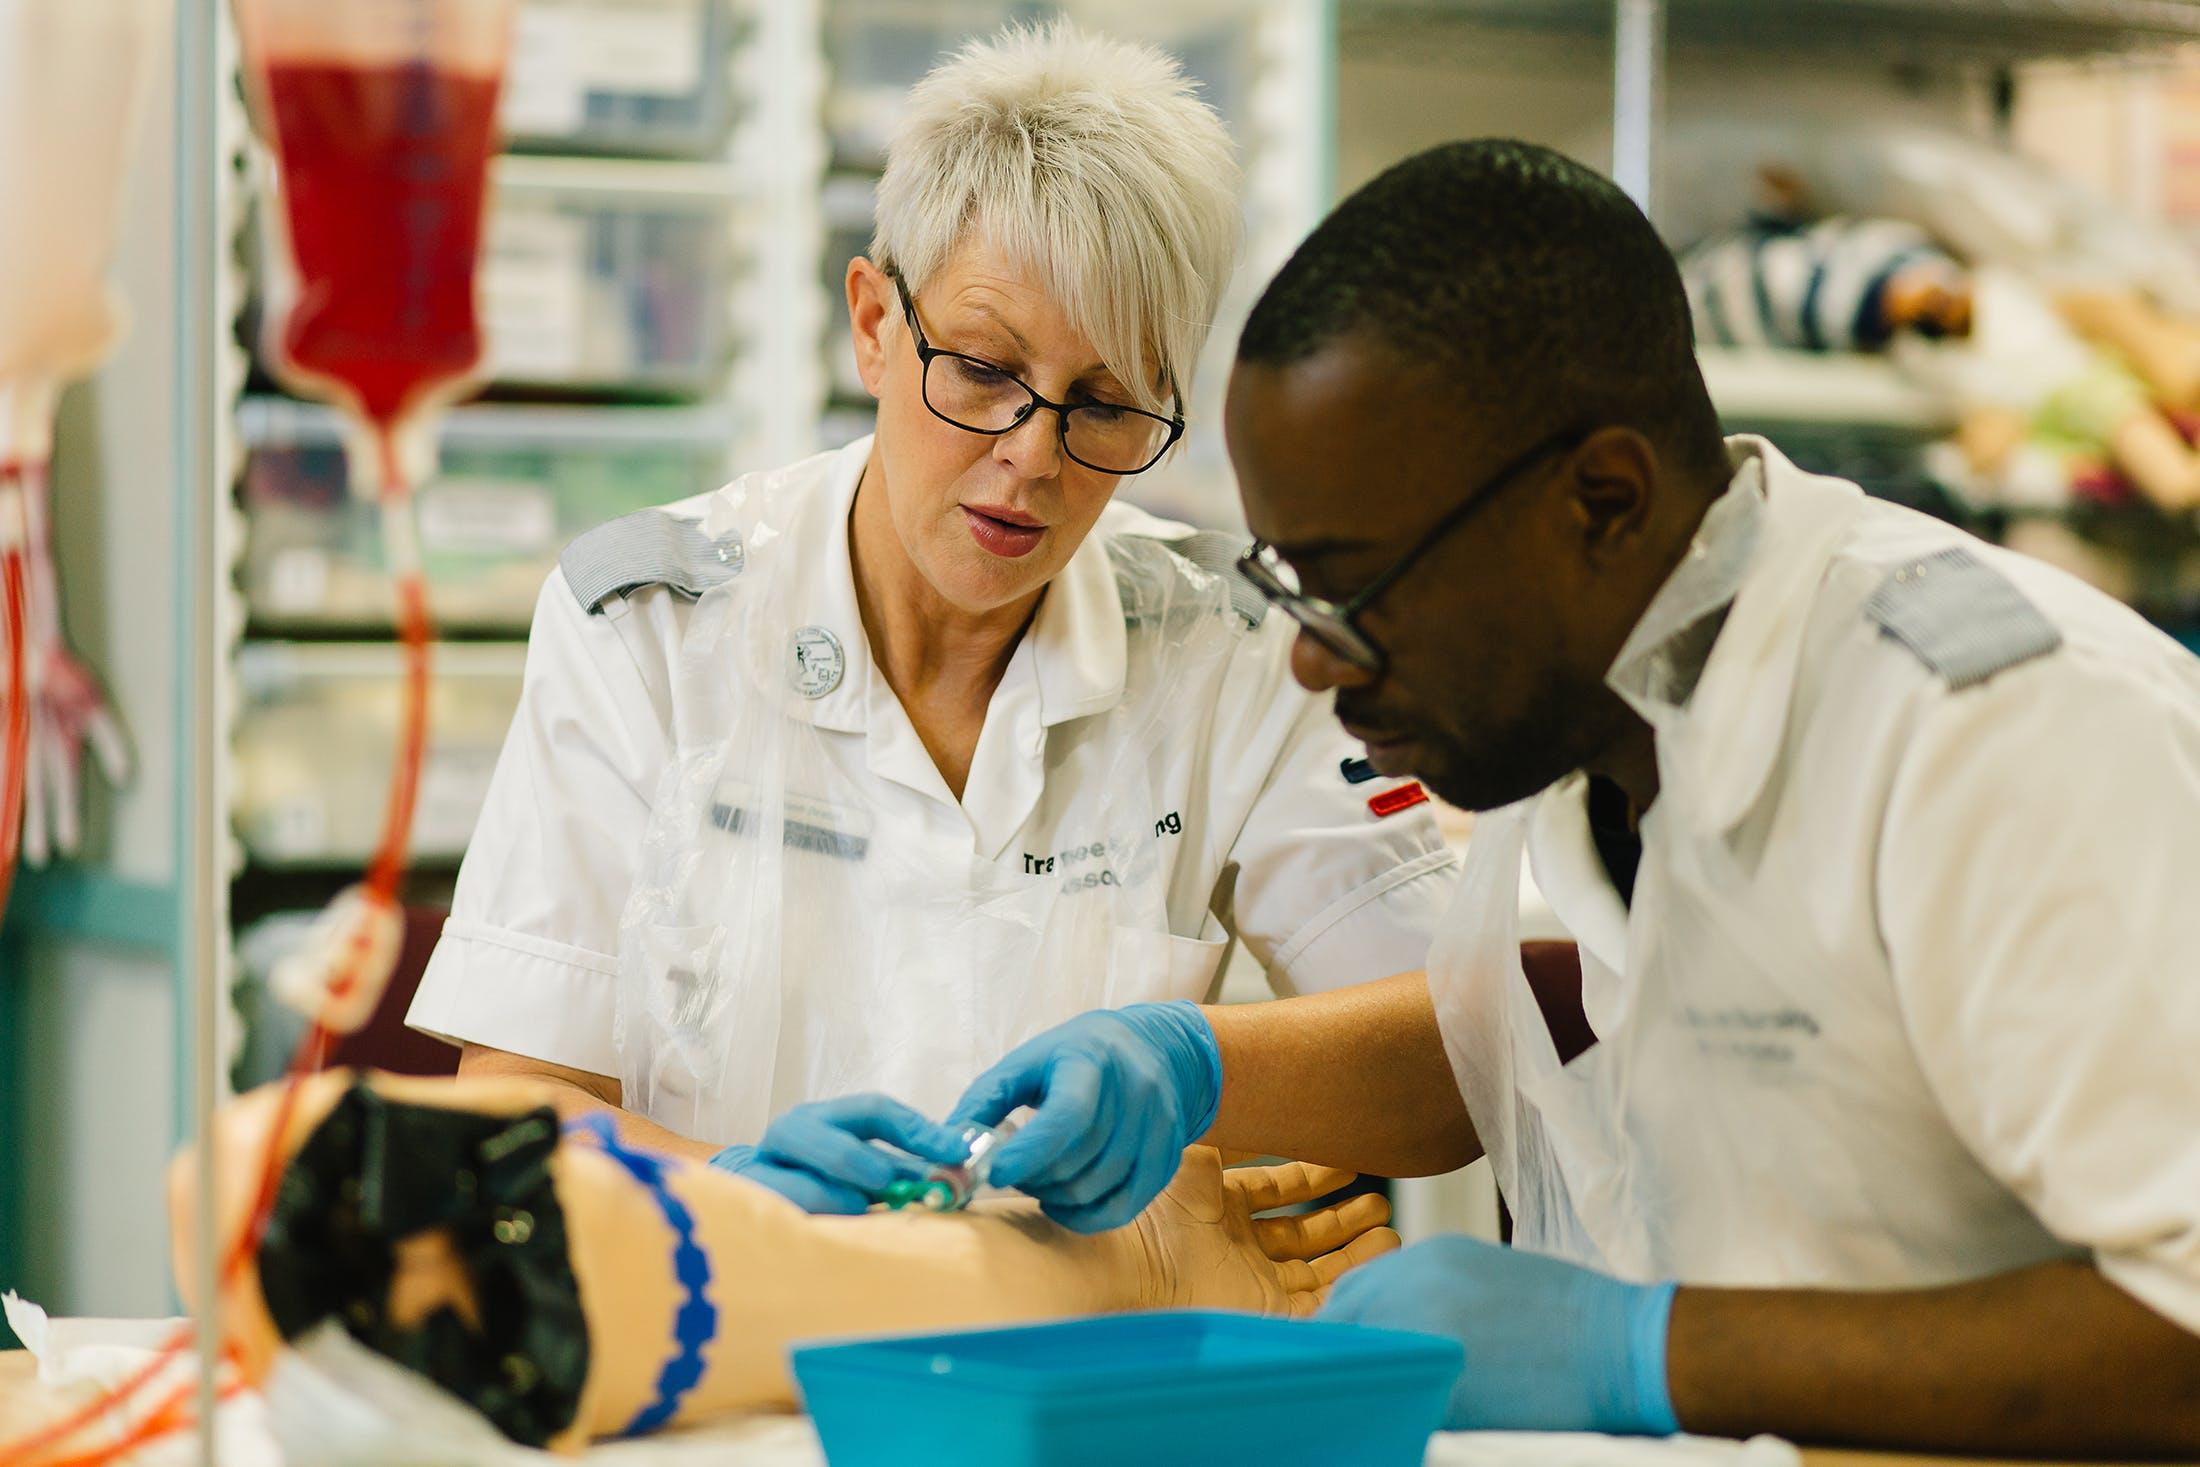 Nursing and Midwifery facilities - 14 skills nursing associates